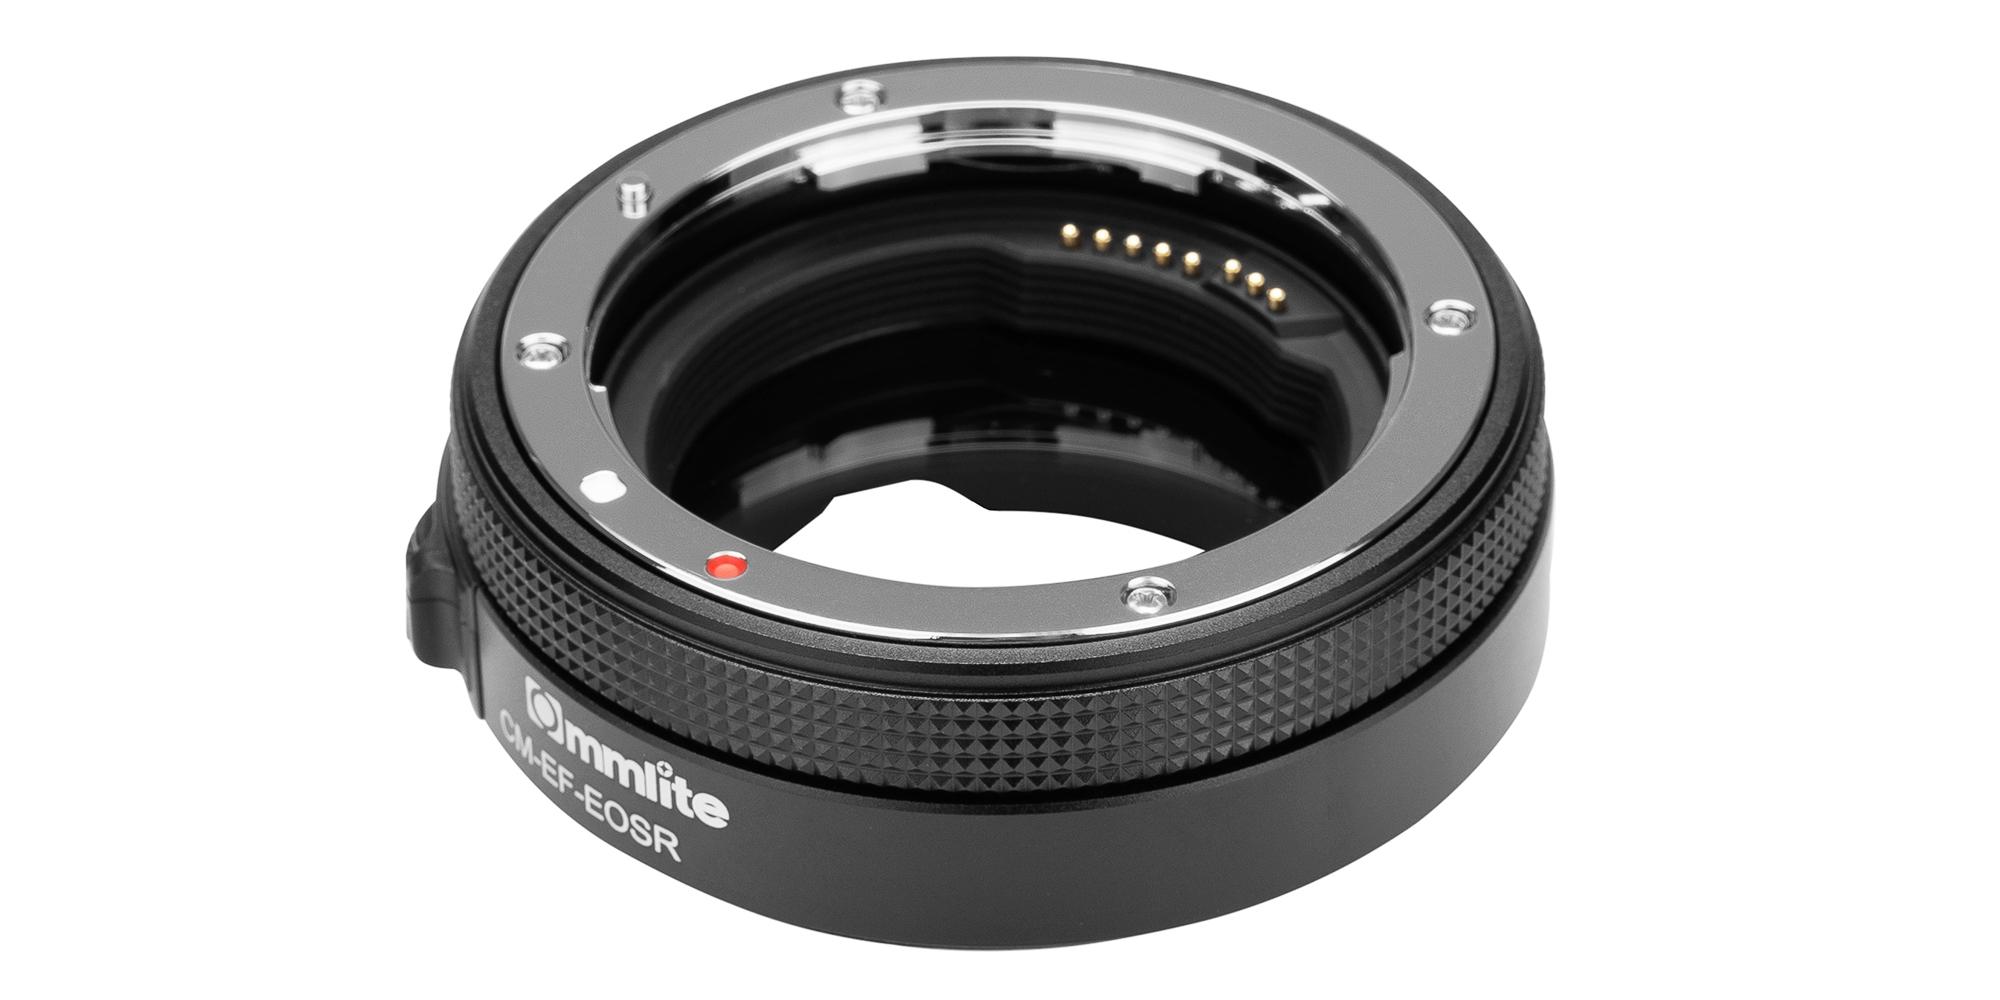 Adapter bagnetowy Commlite CM-EF-EOSR VND - mocowanie na obiektyw Canon EF